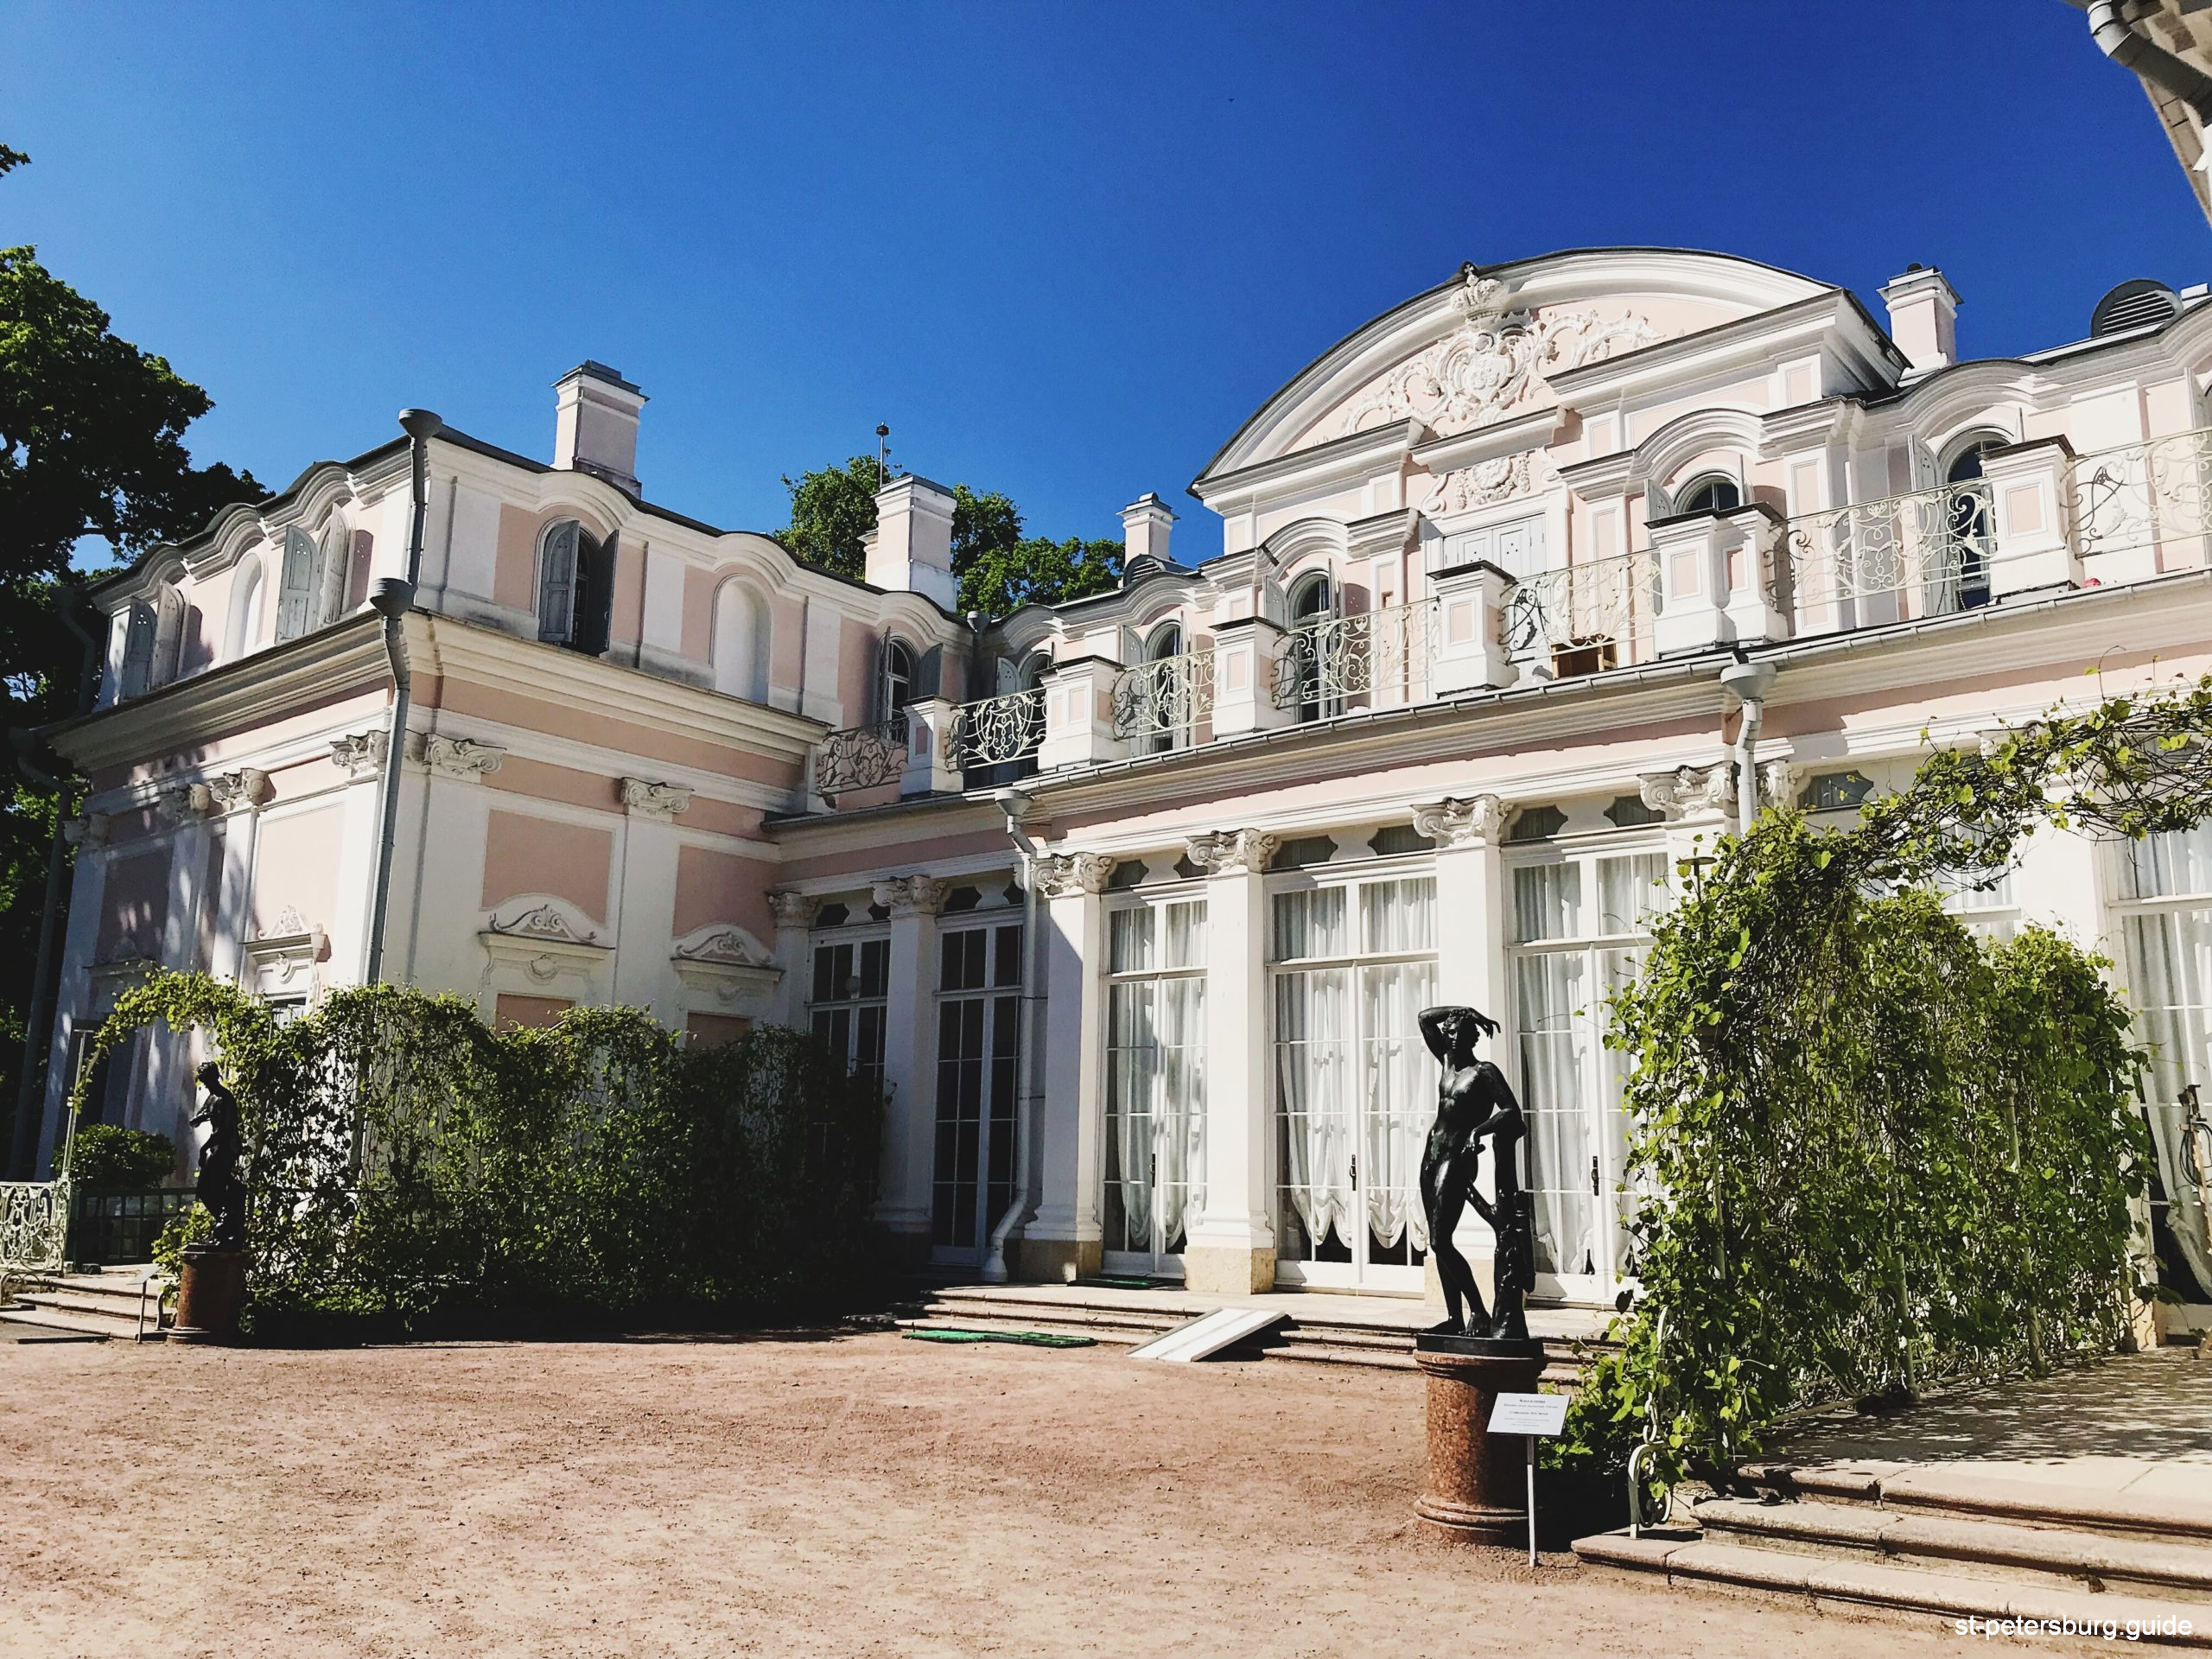 Palace in Oranienbaum, Saint Petersburg